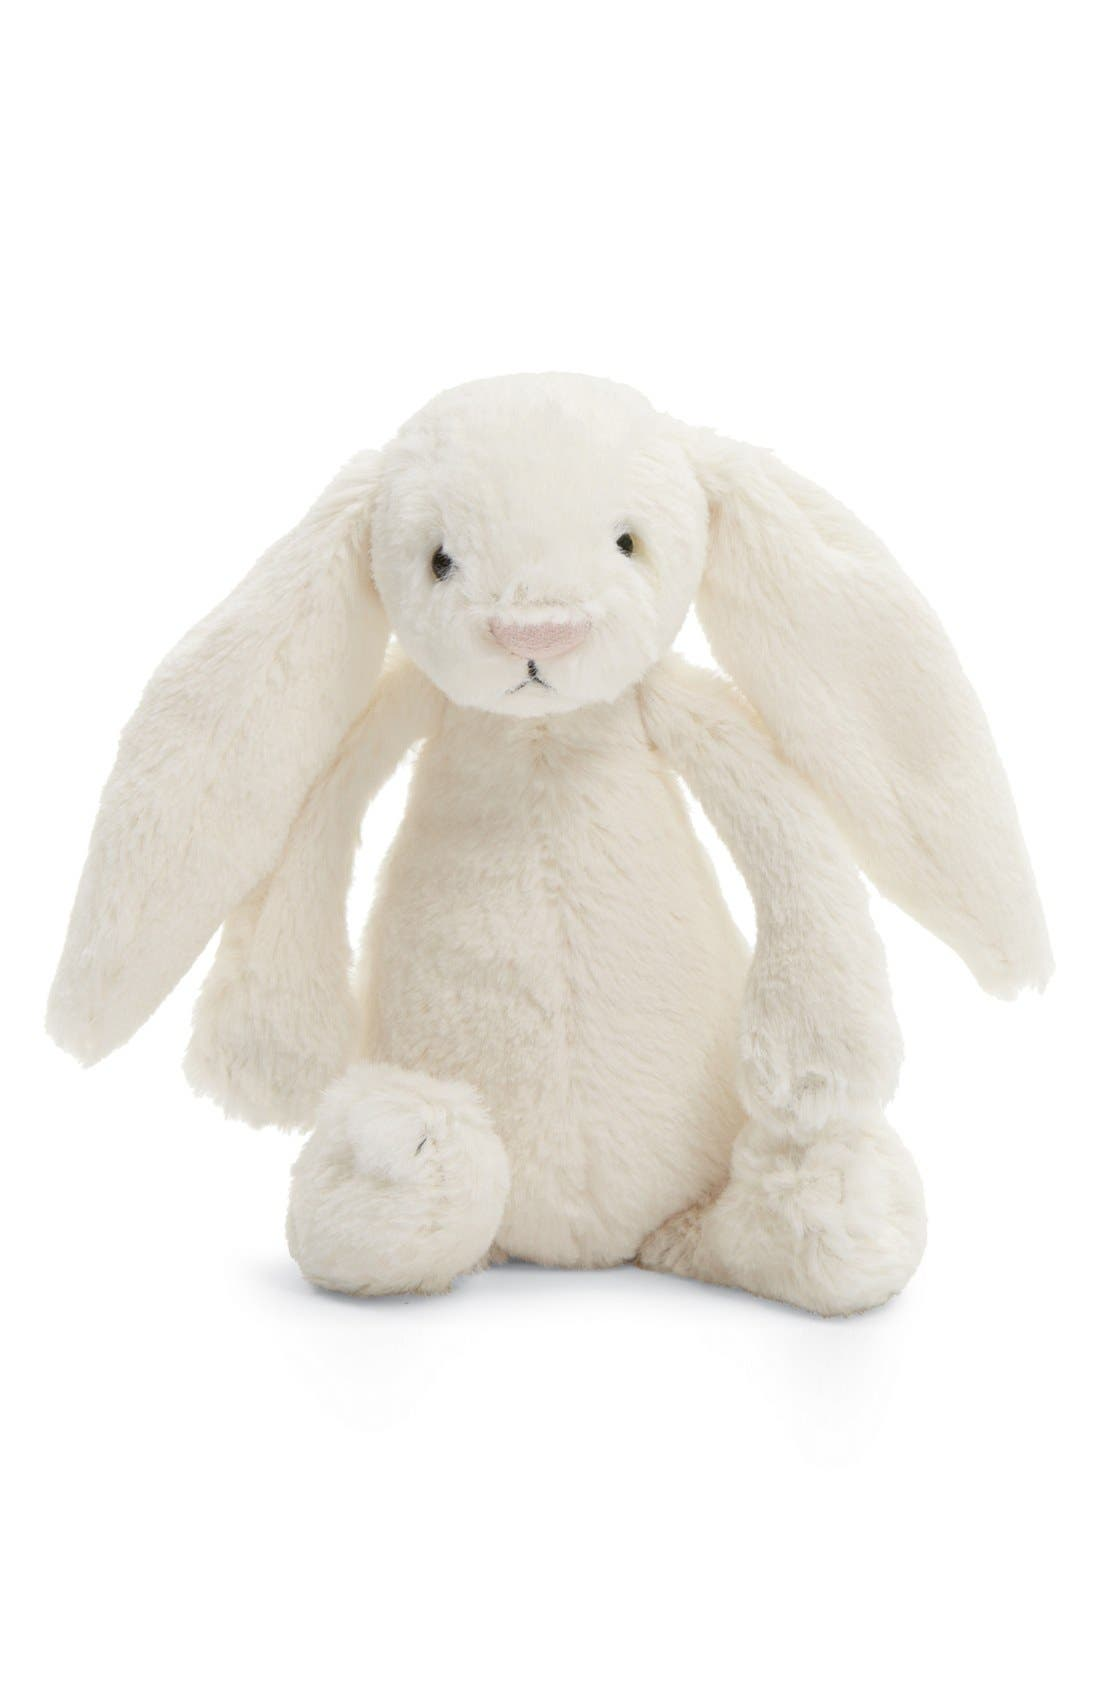 'Large Bashful Bunny' Stuffed Animal,                             Main thumbnail 1, color,                             900